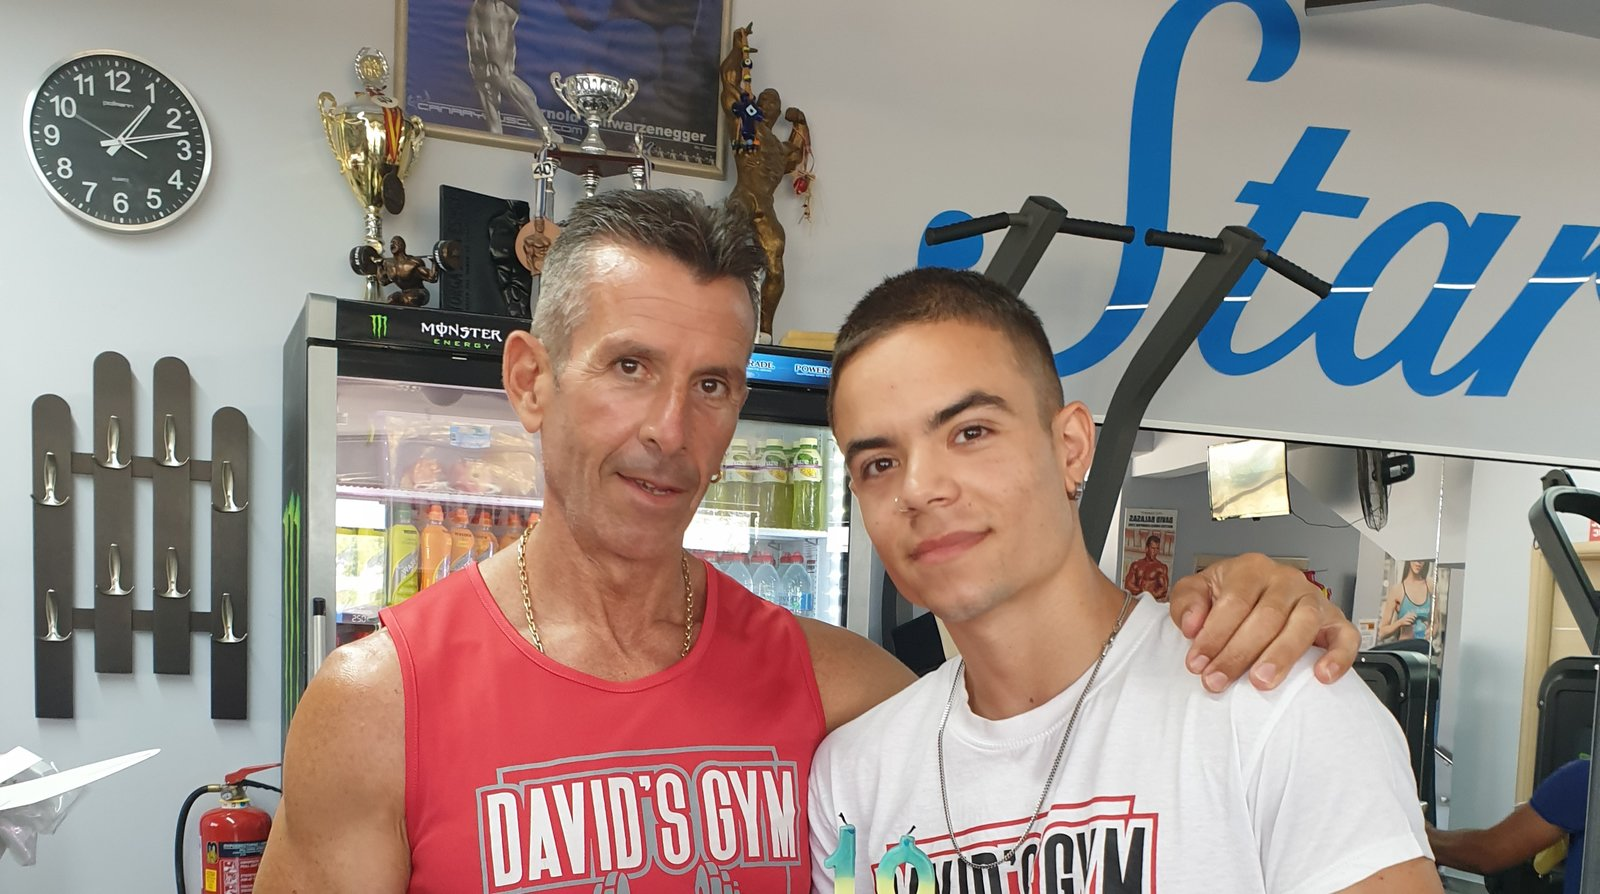 David's fitness Stars